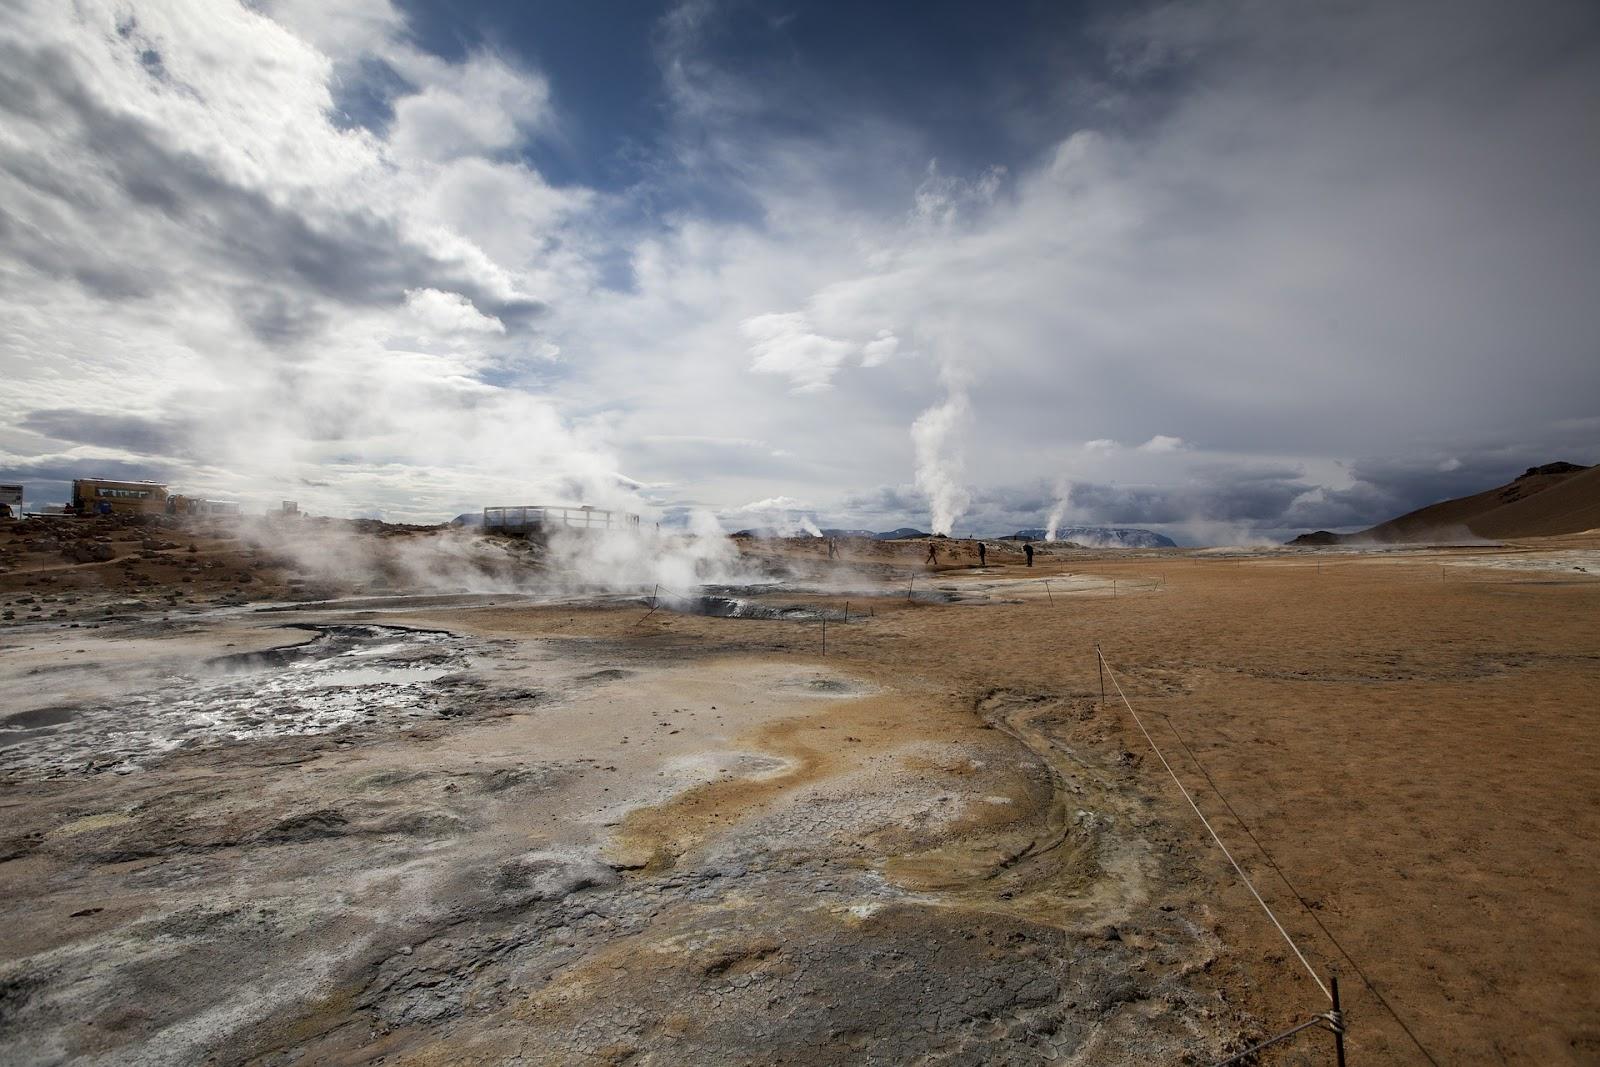 hverir geothermal site evaporating from geysers in iceland